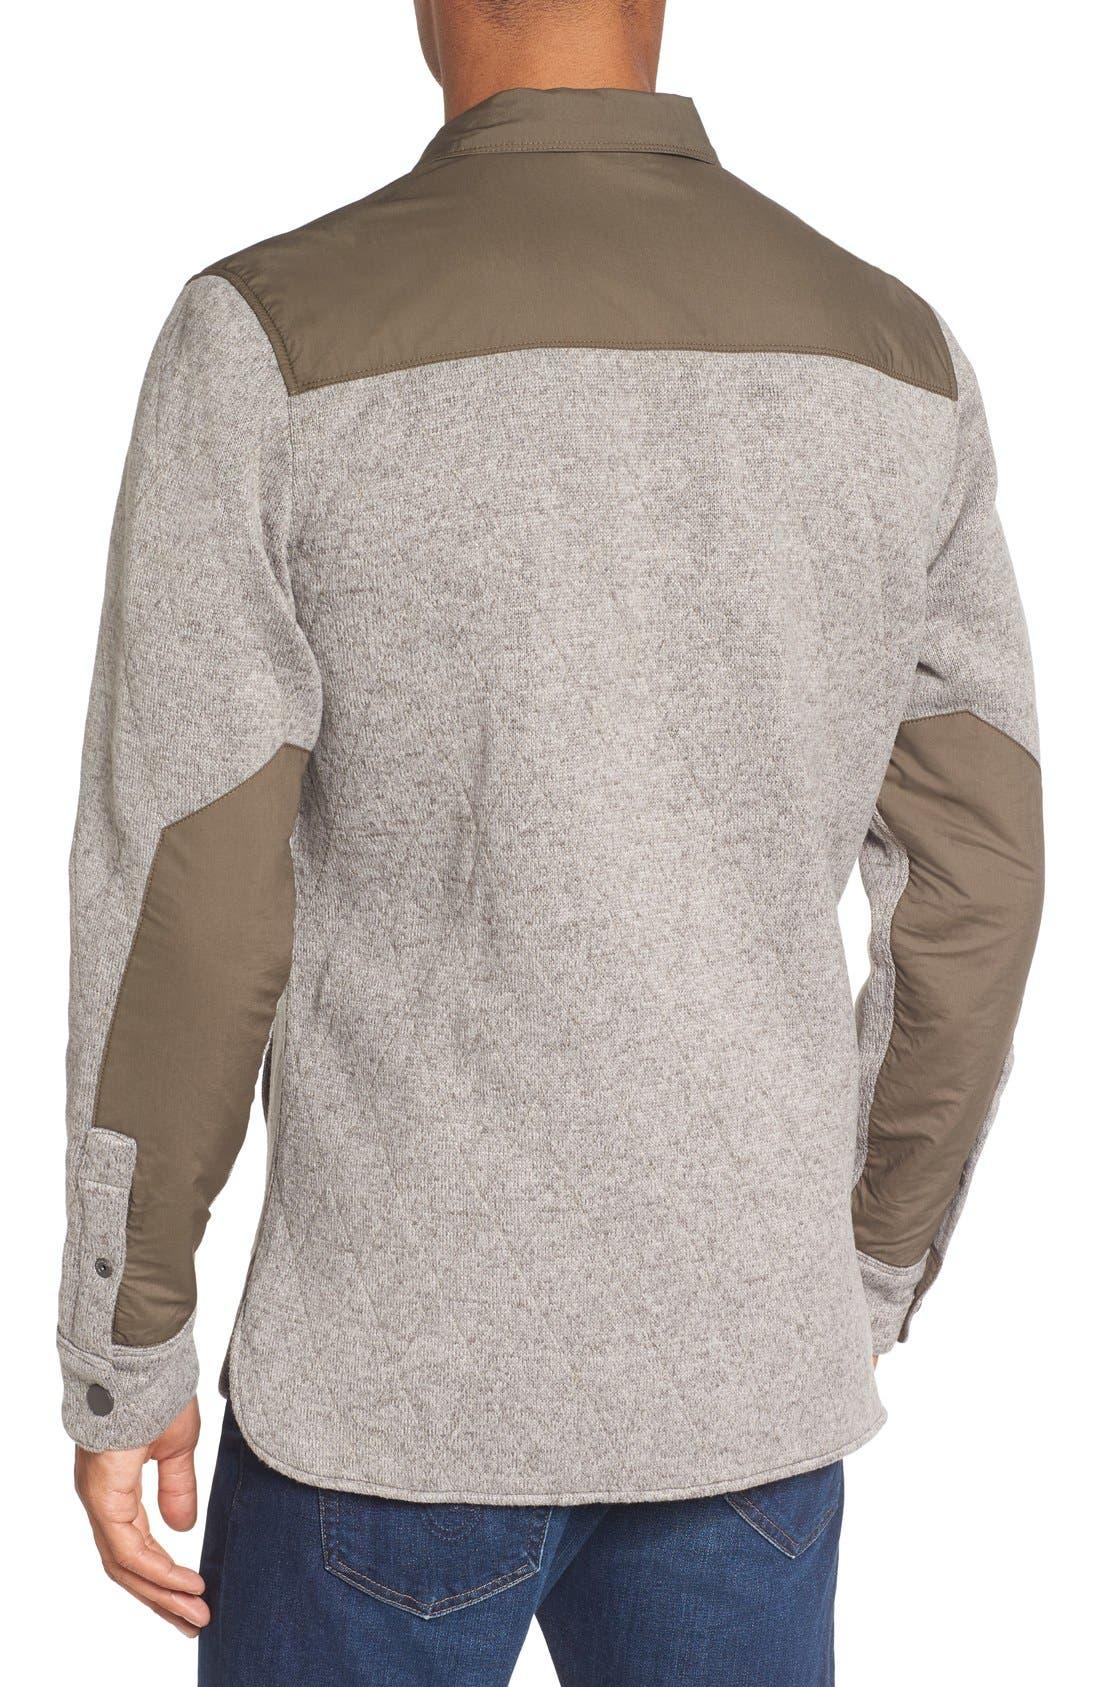 Alternate Image 2  - Jeremiah Quilted Fleece Shirt Jacket